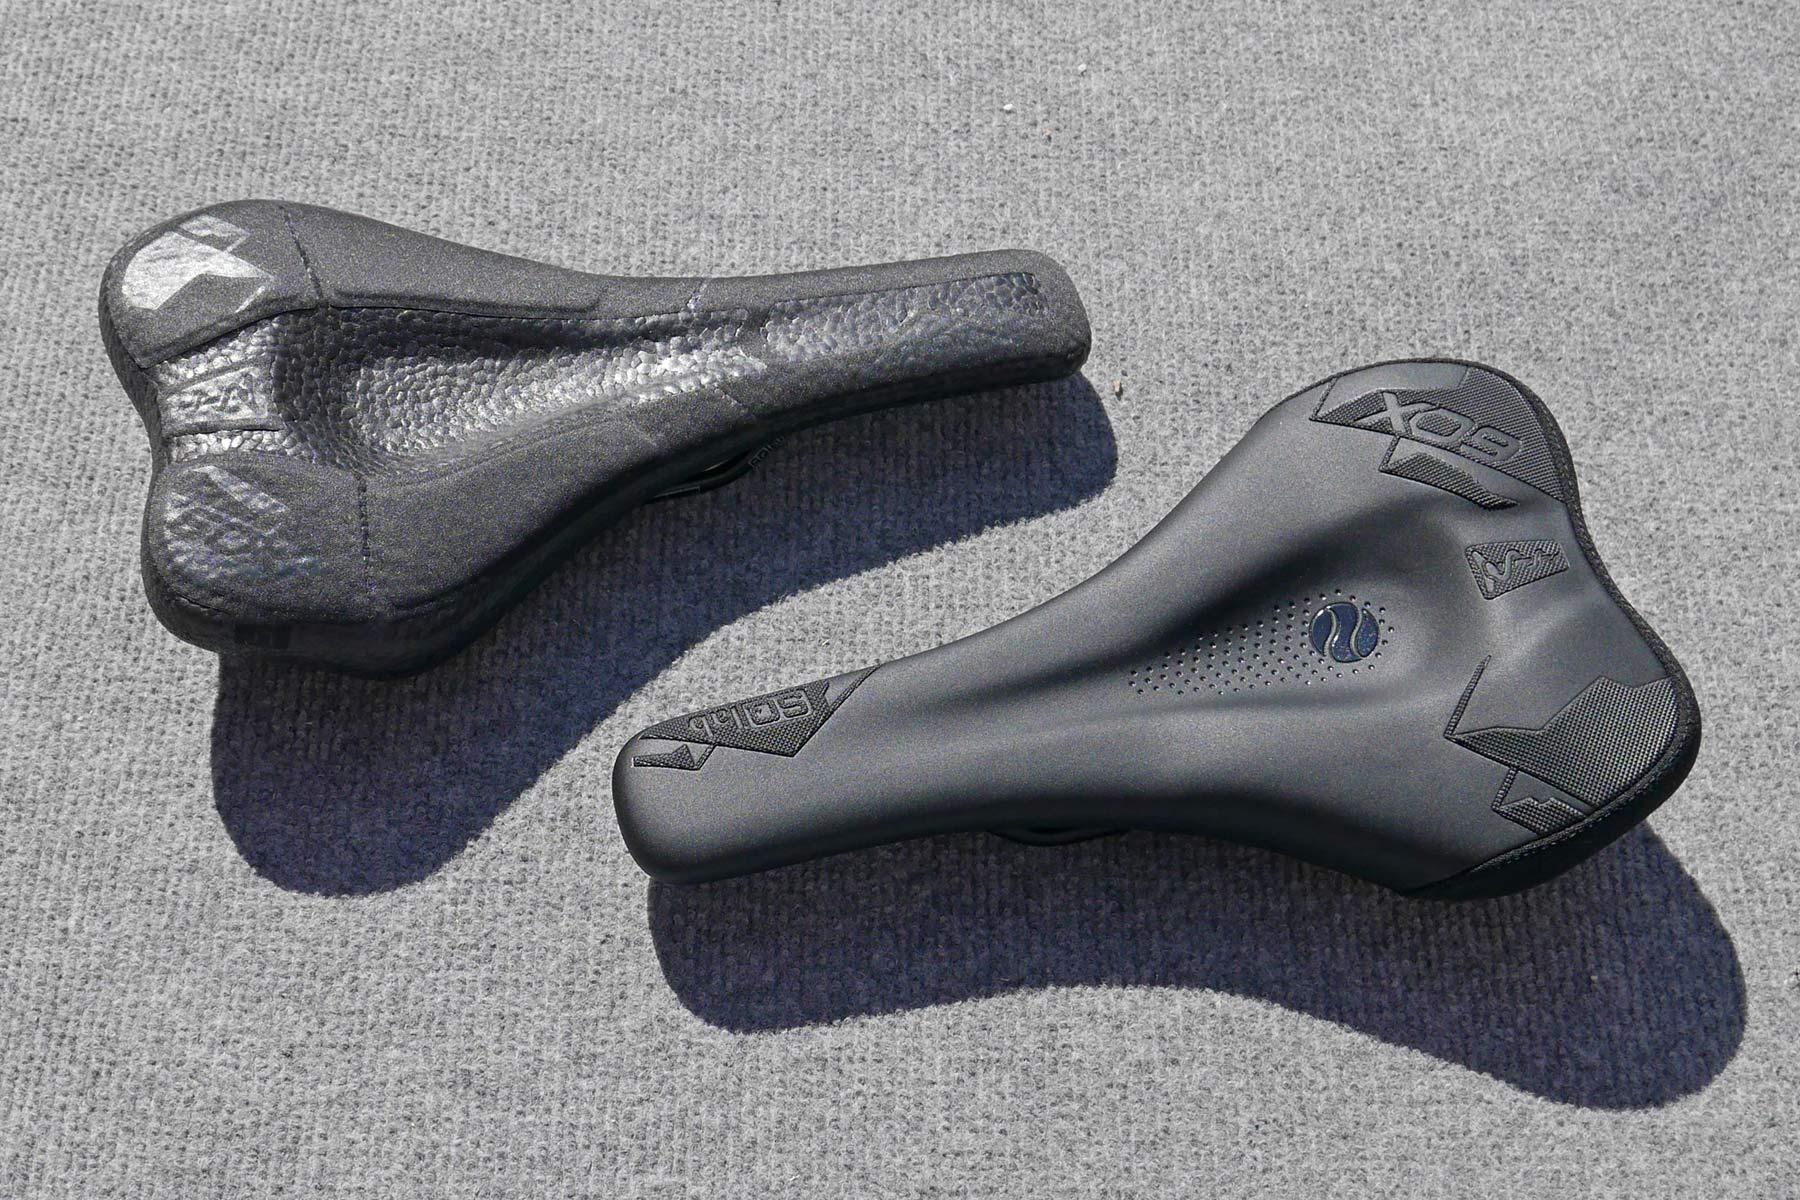 SQlab 60X Infinergy Ergowave ergonomic MTB saddle, old vs. new